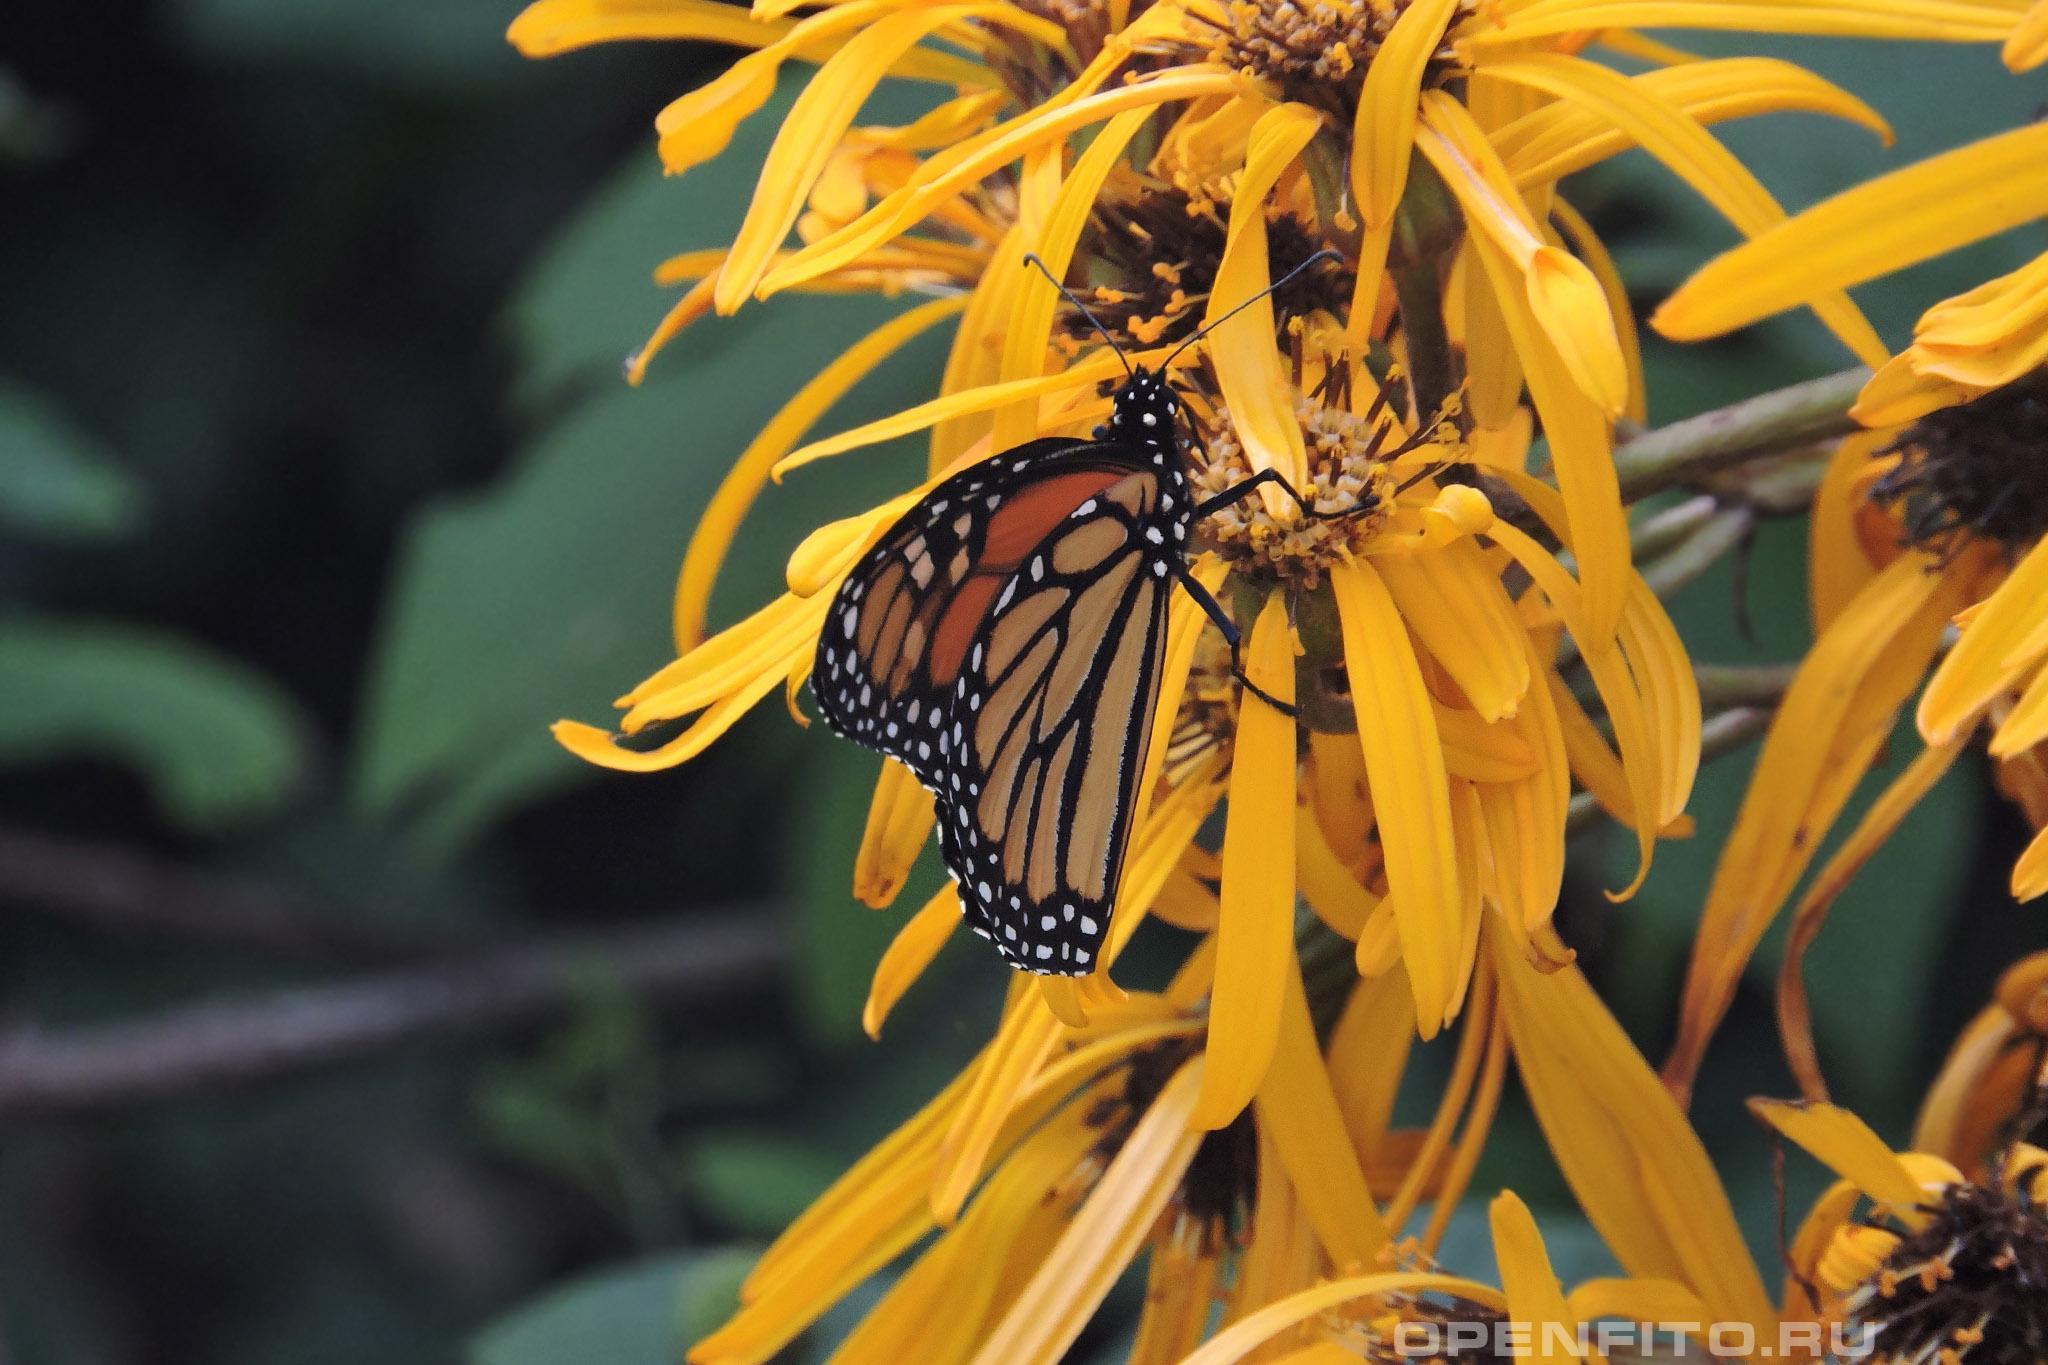 Бузульник зубчатый бабочка на цветке